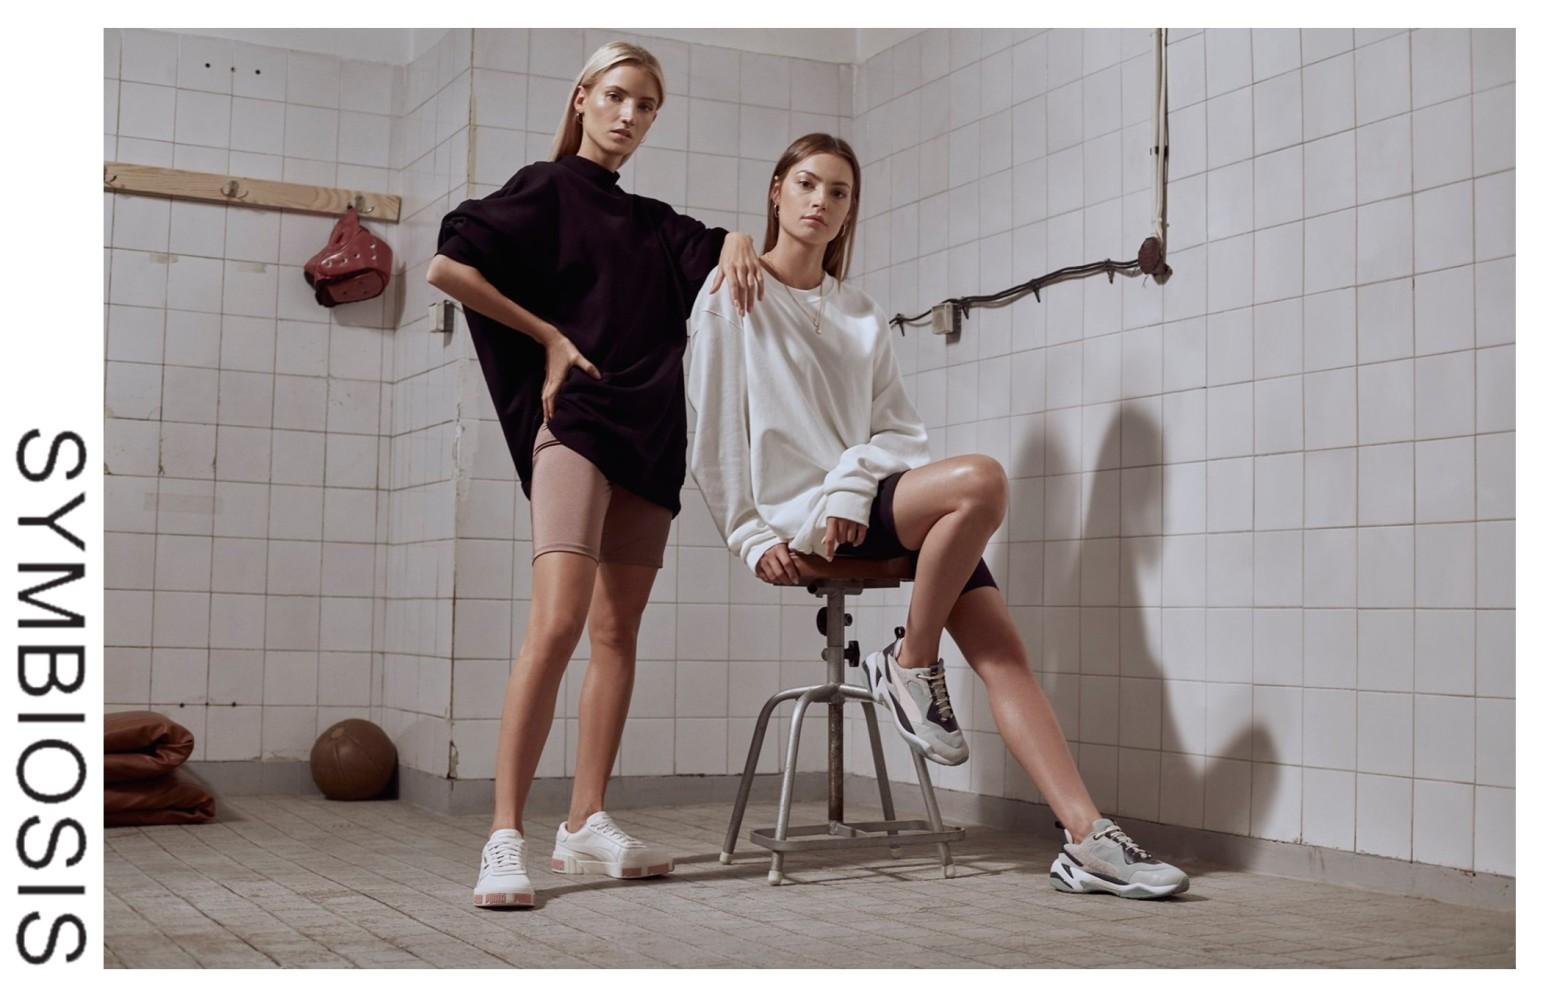 Agata Sieramska & Natalia Chojnacka for SYMBIOSIS New Campaign